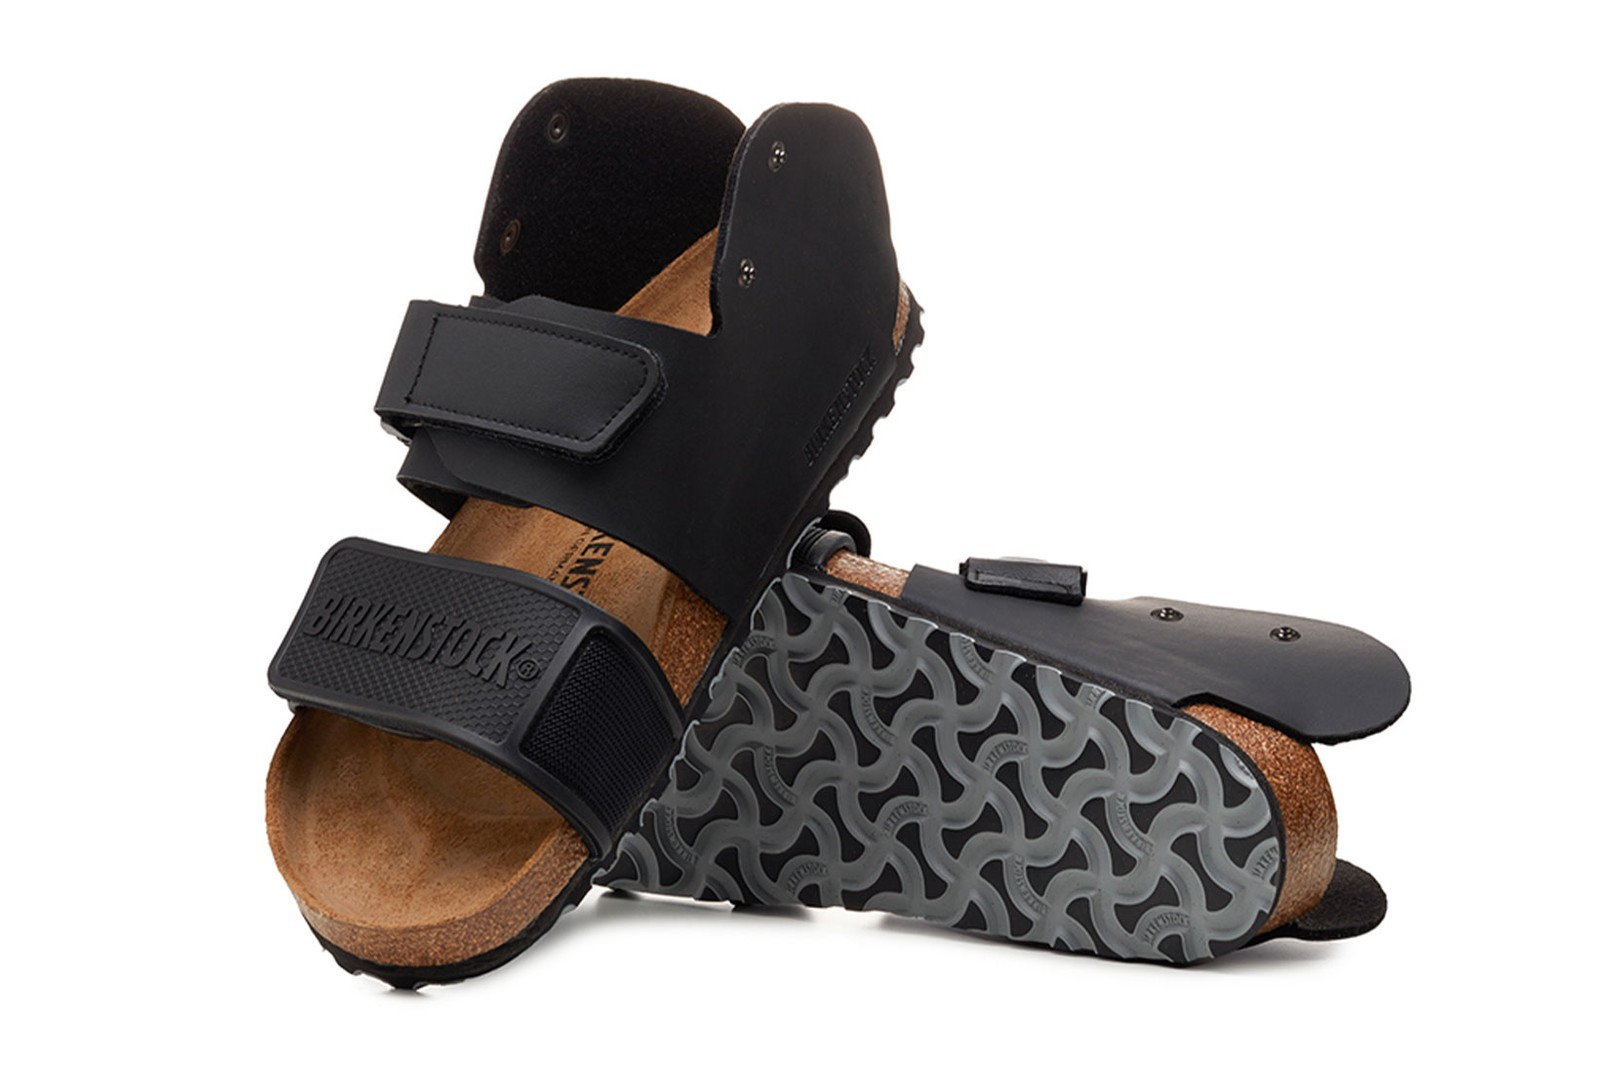 birkenstock central saint martins csm ual collaboration sandals slides emerging designers dingyun zhang saskia lenaerts alecsander rothschild alex wolfe